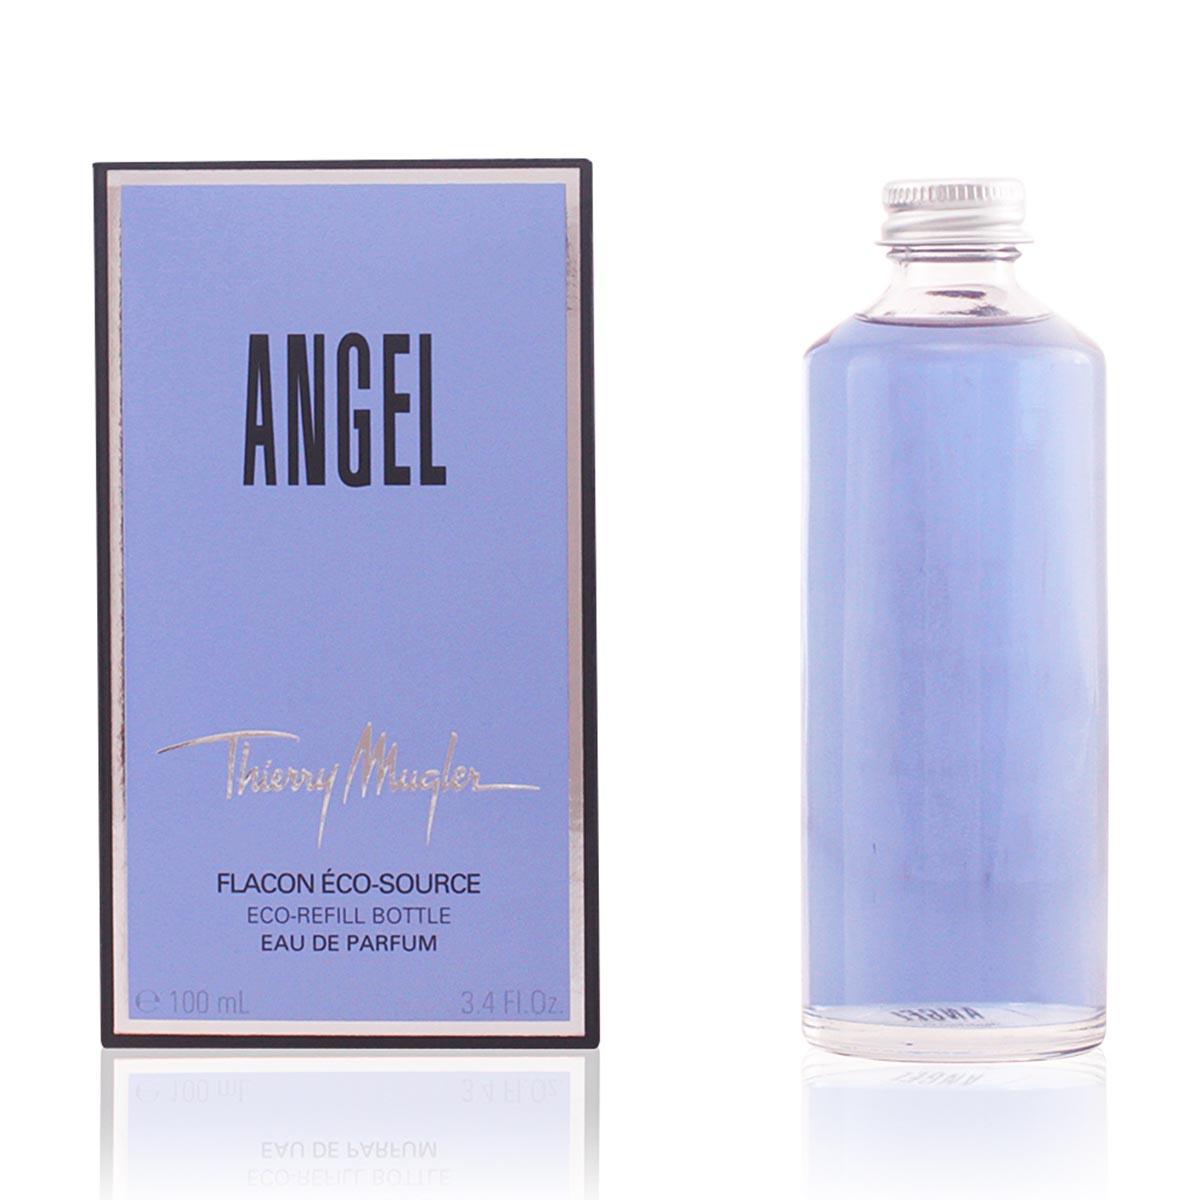 Thierry mugler angel eco refill botella eau de parfum 100ml